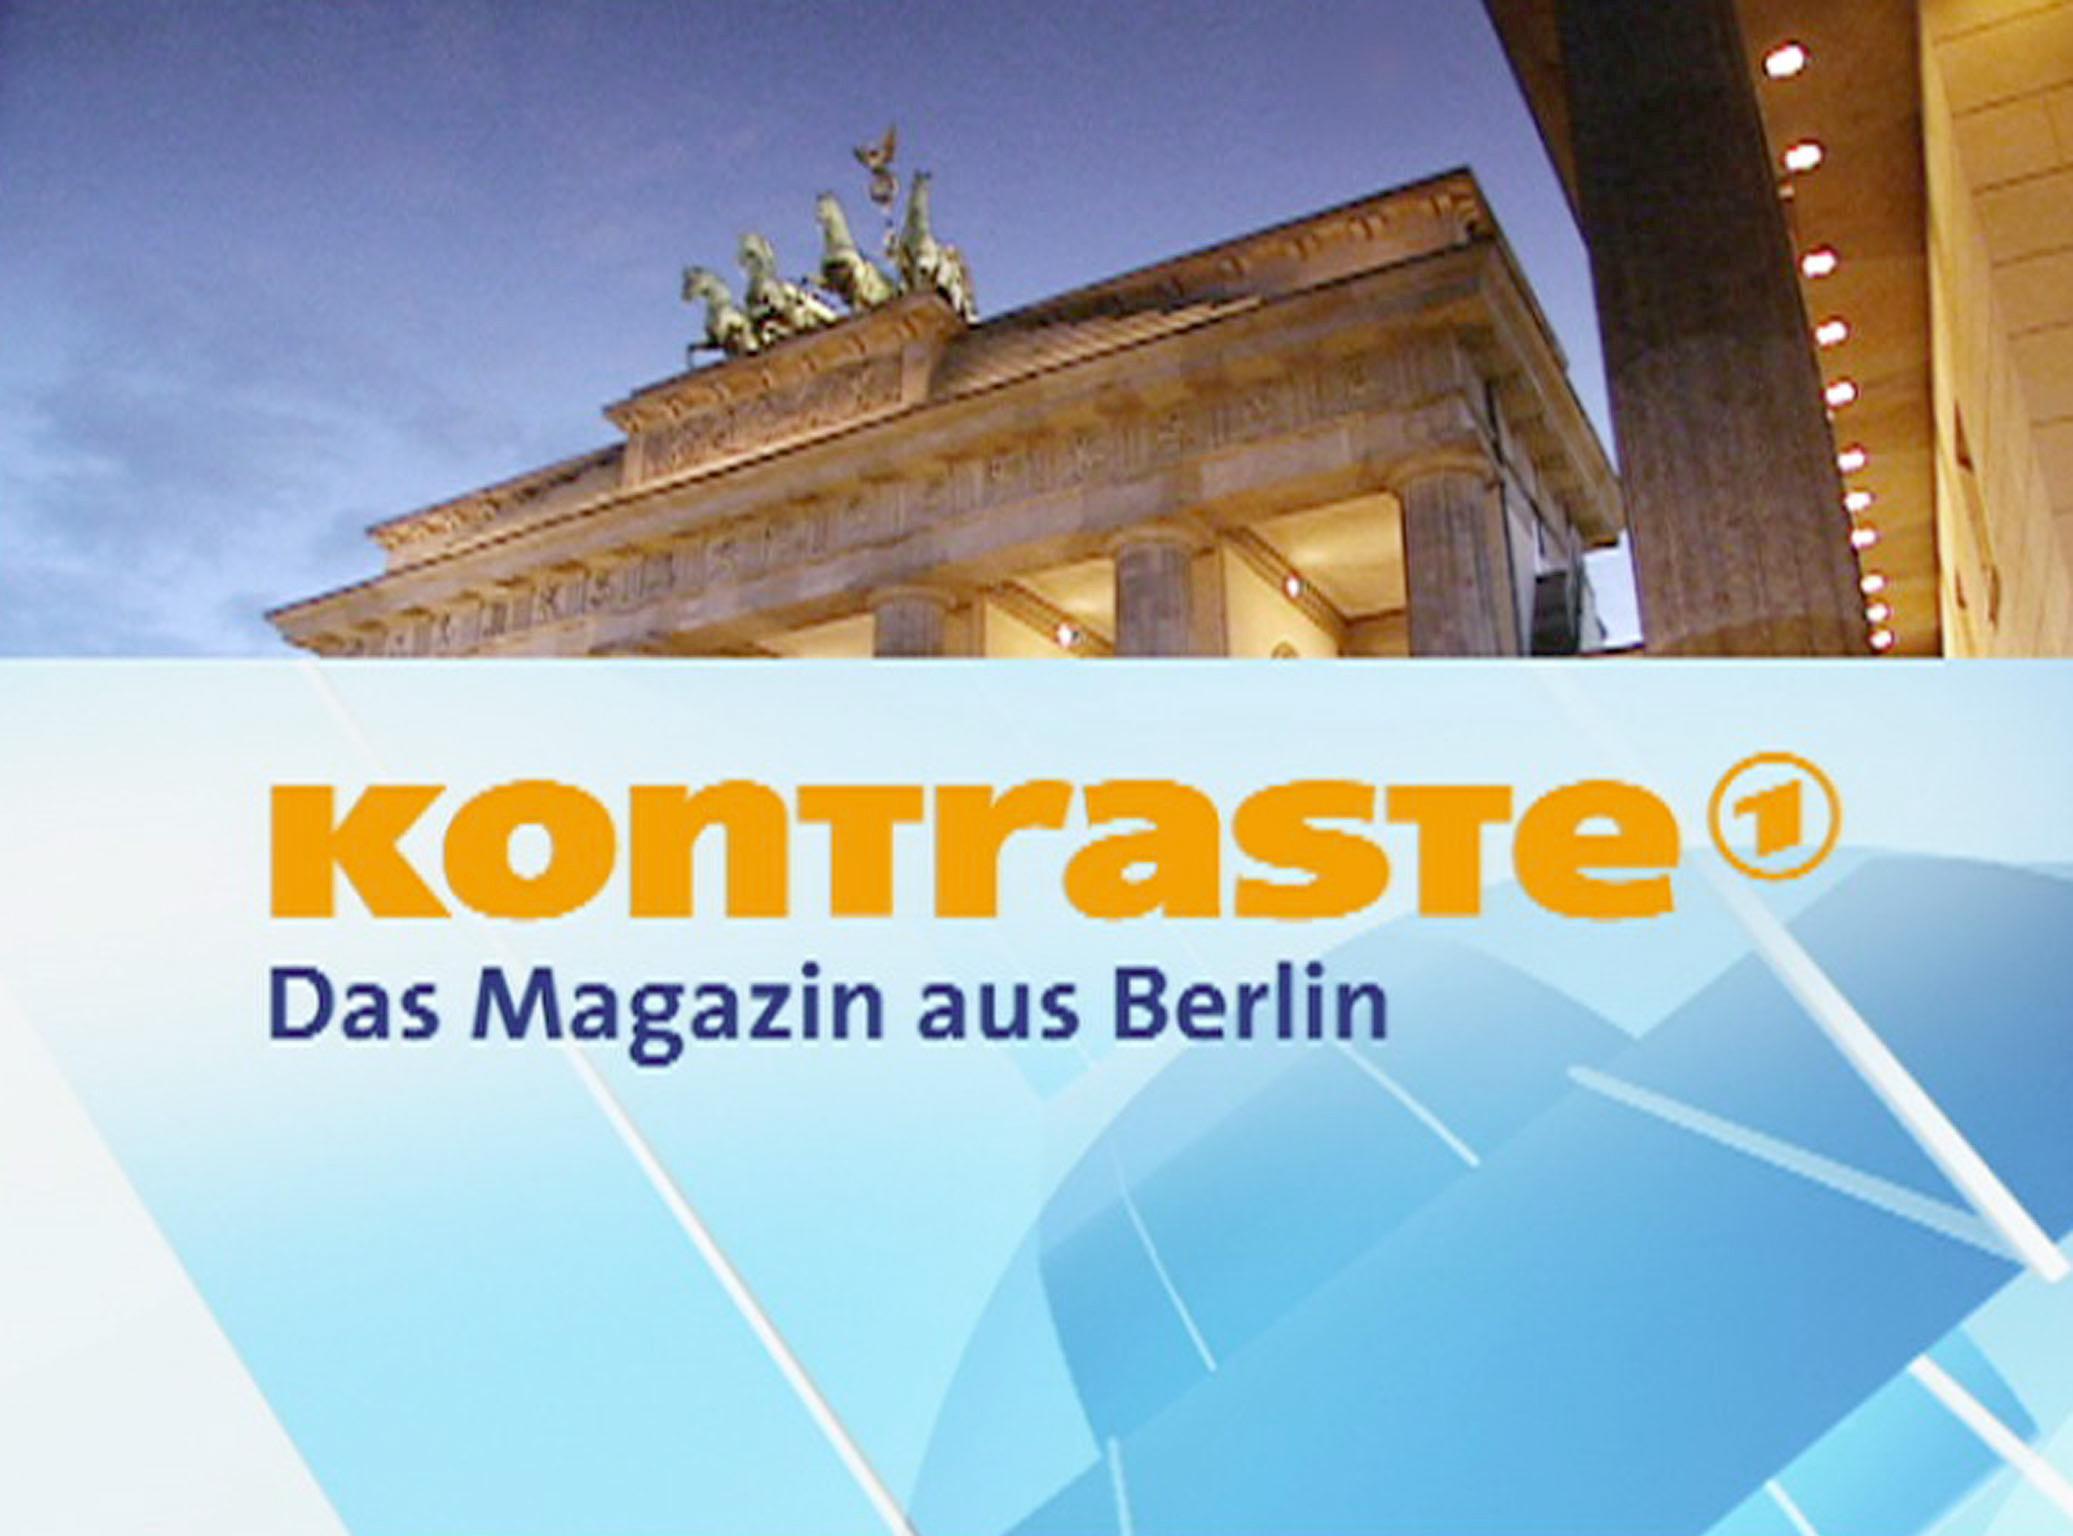 TV Infos & TV News @ TV-Info-247.de | ARD Politikmagazin Kontraste